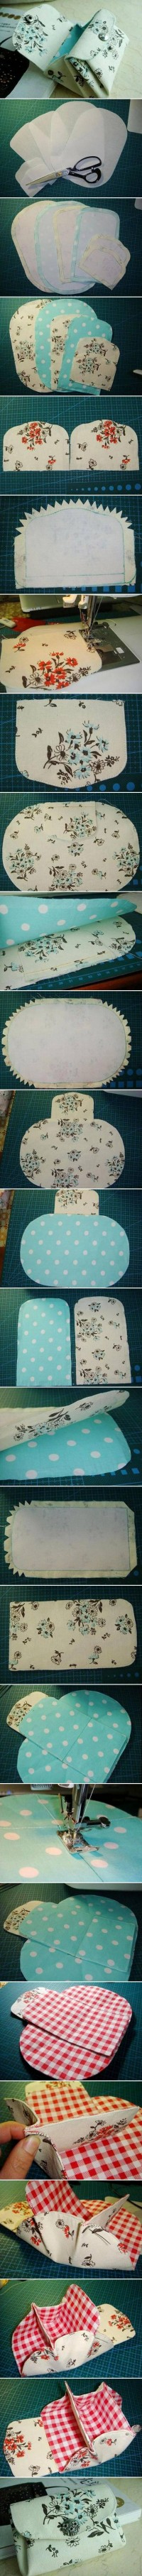 DIY Fabric Folding Purse DIY Projects | UsefulDIY.com